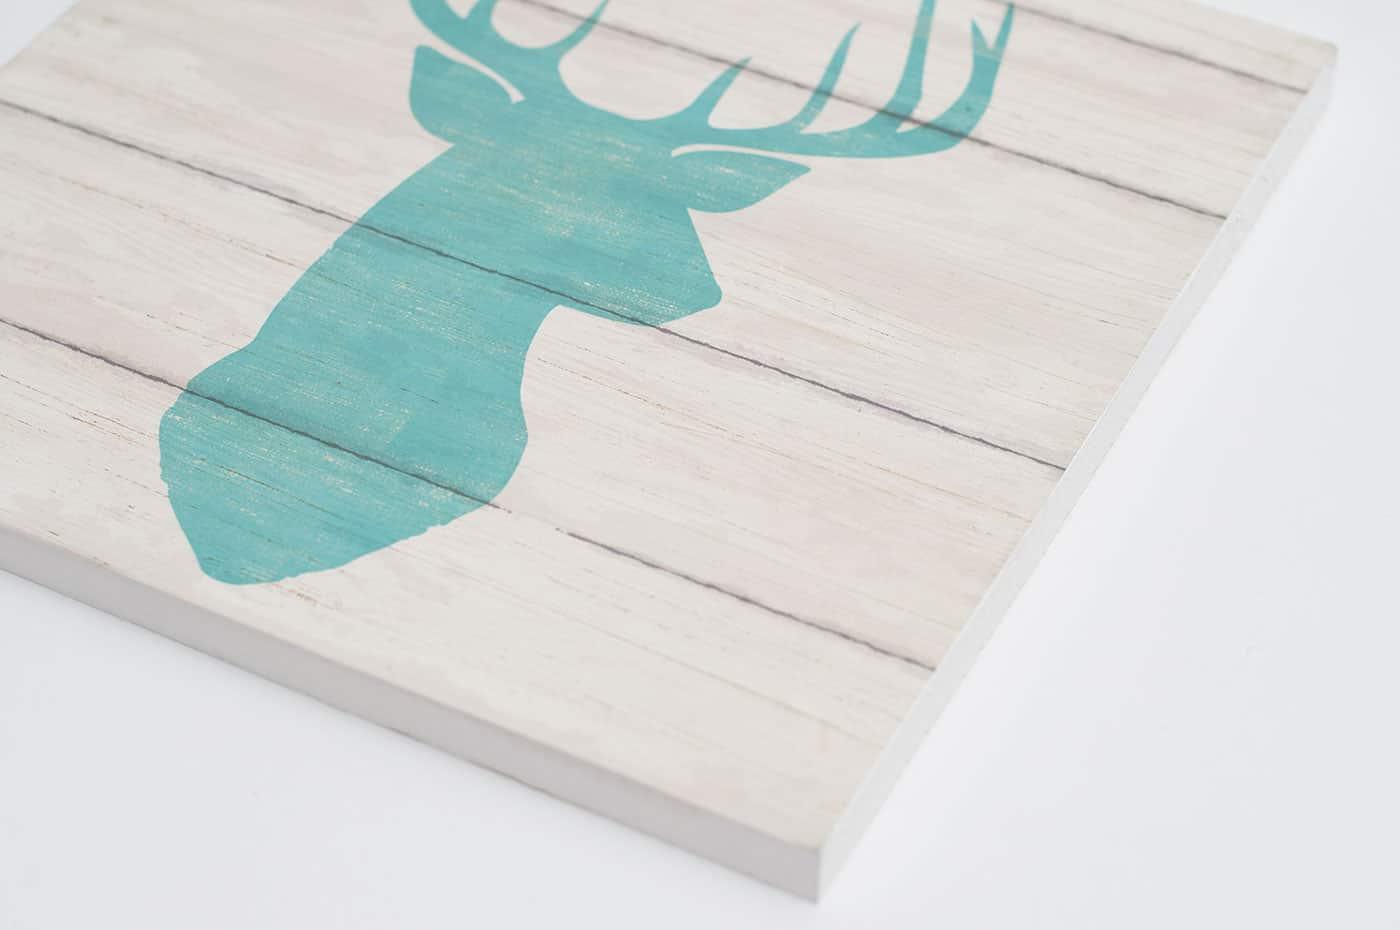 Diy Wall Art Using Scrapbook Paper : Easy diy wall art with scrapbook paper mod podge rocks